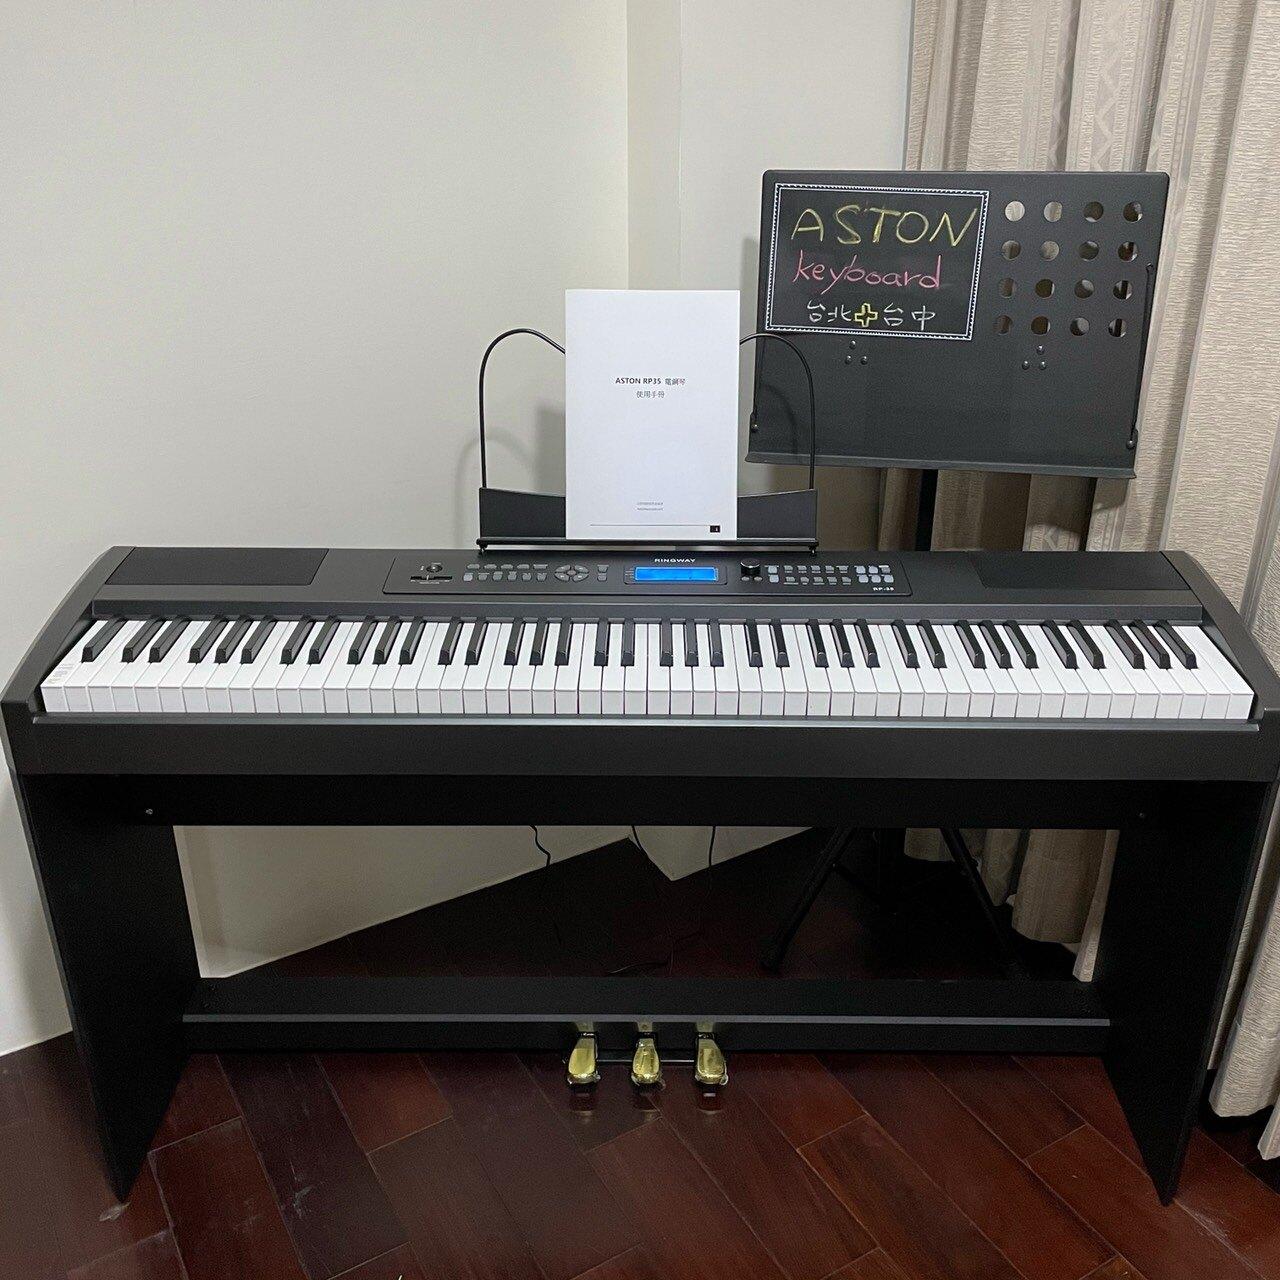 ASTON RP35 重鍵電鋼琴 88鍵 無息分期[亞斯頓鍵盤樂器] FP30 P125